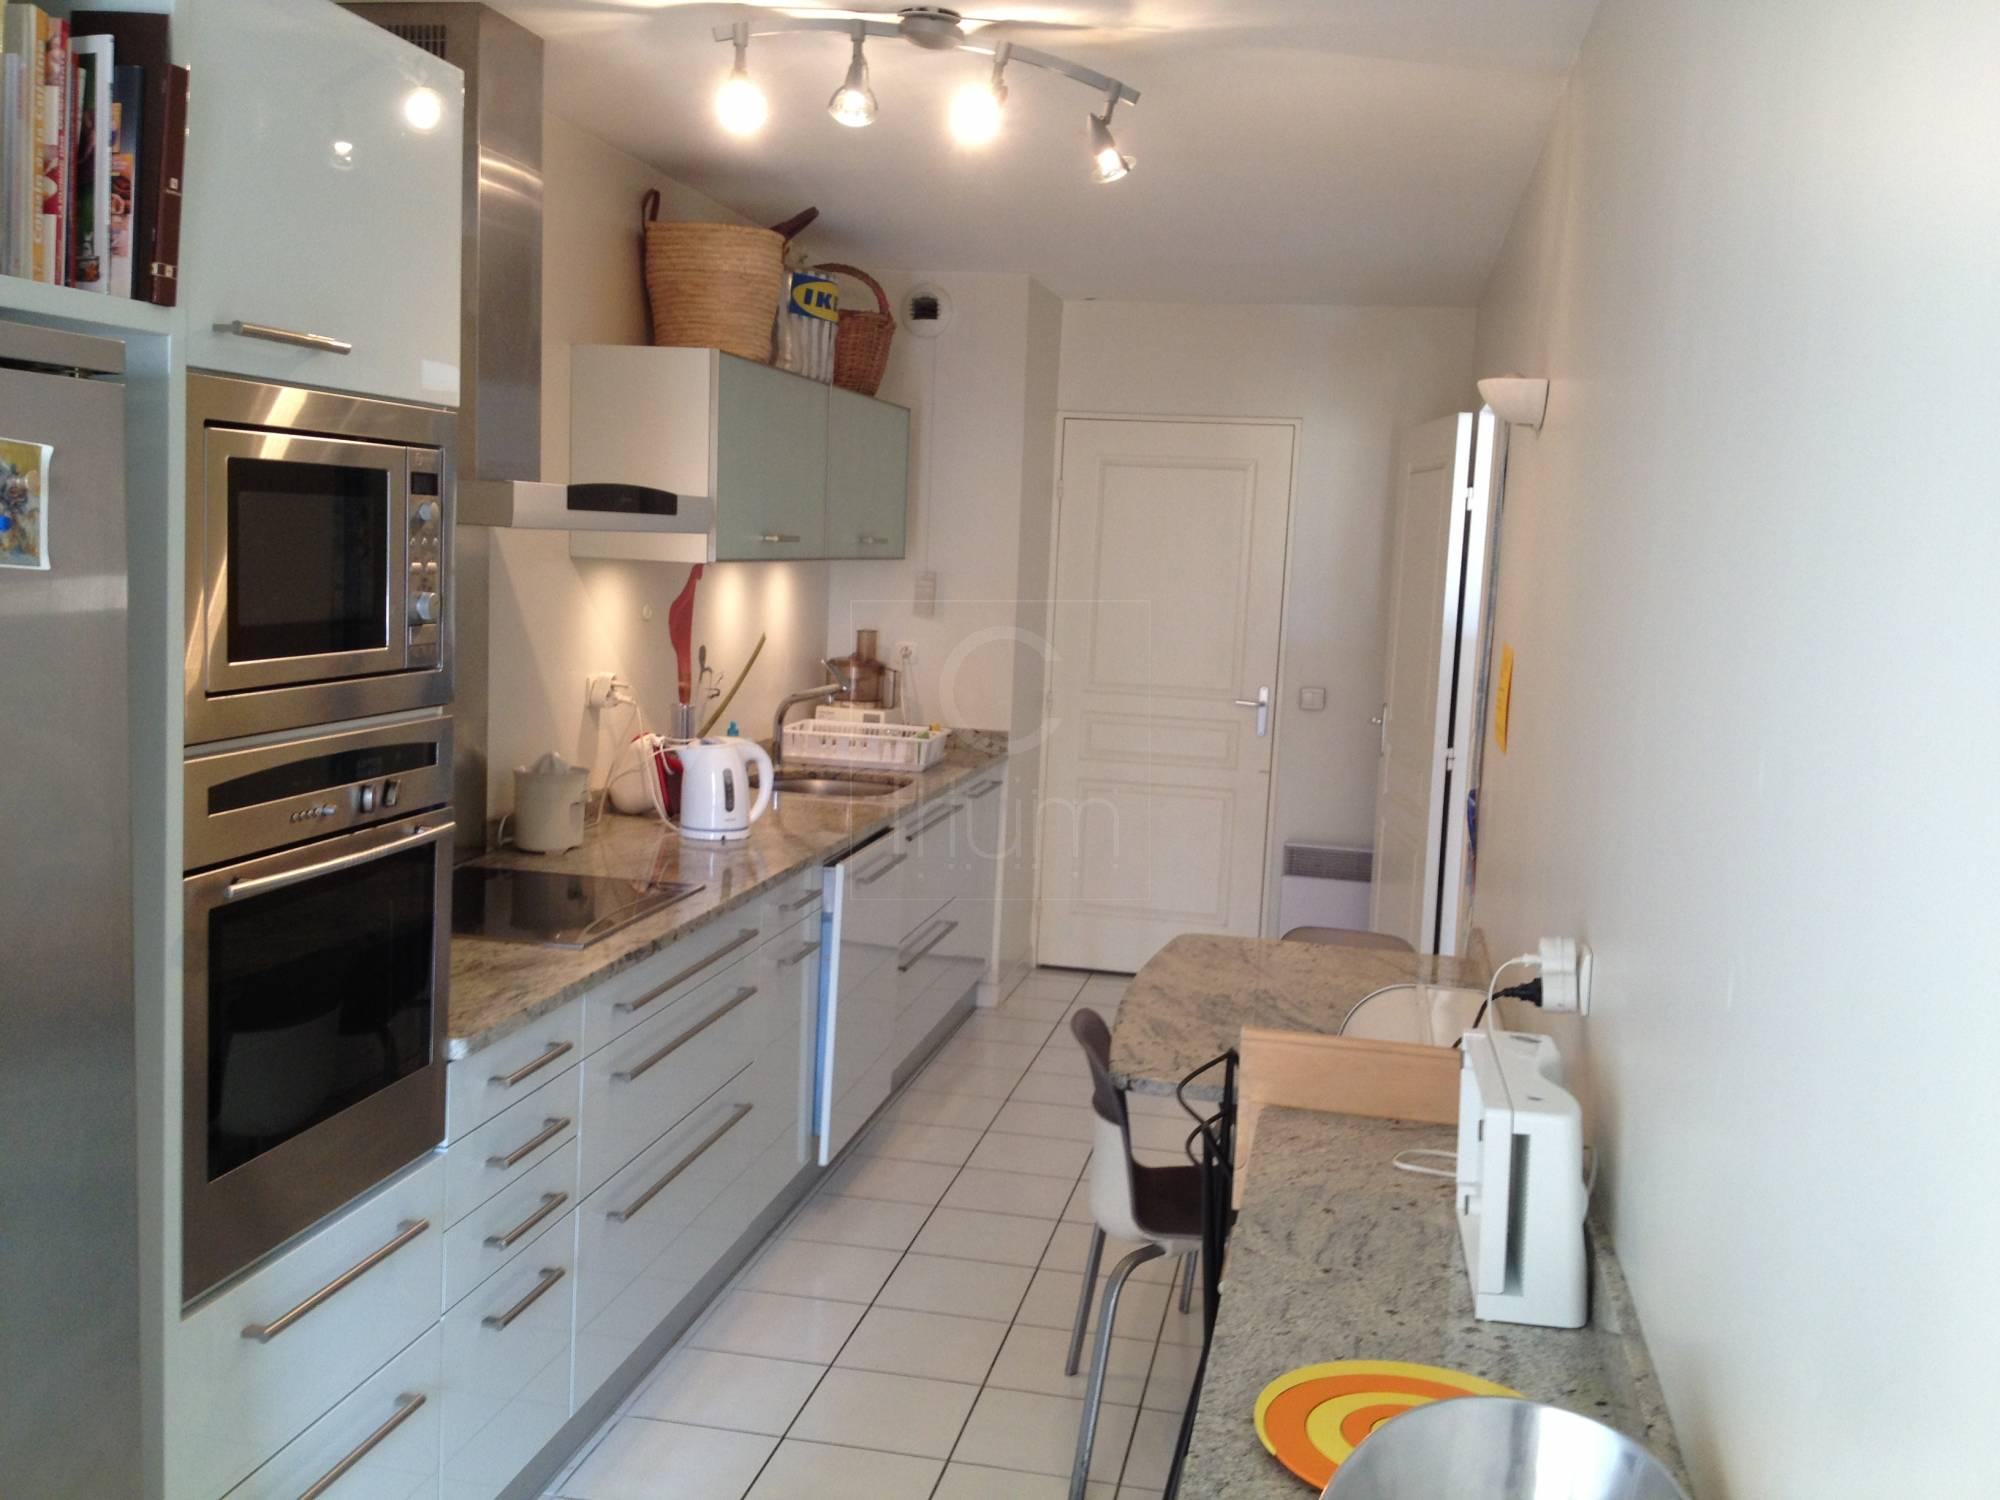 Vente appartement t4 f4 marseille 13006 proximit rue for Deco appartement t4